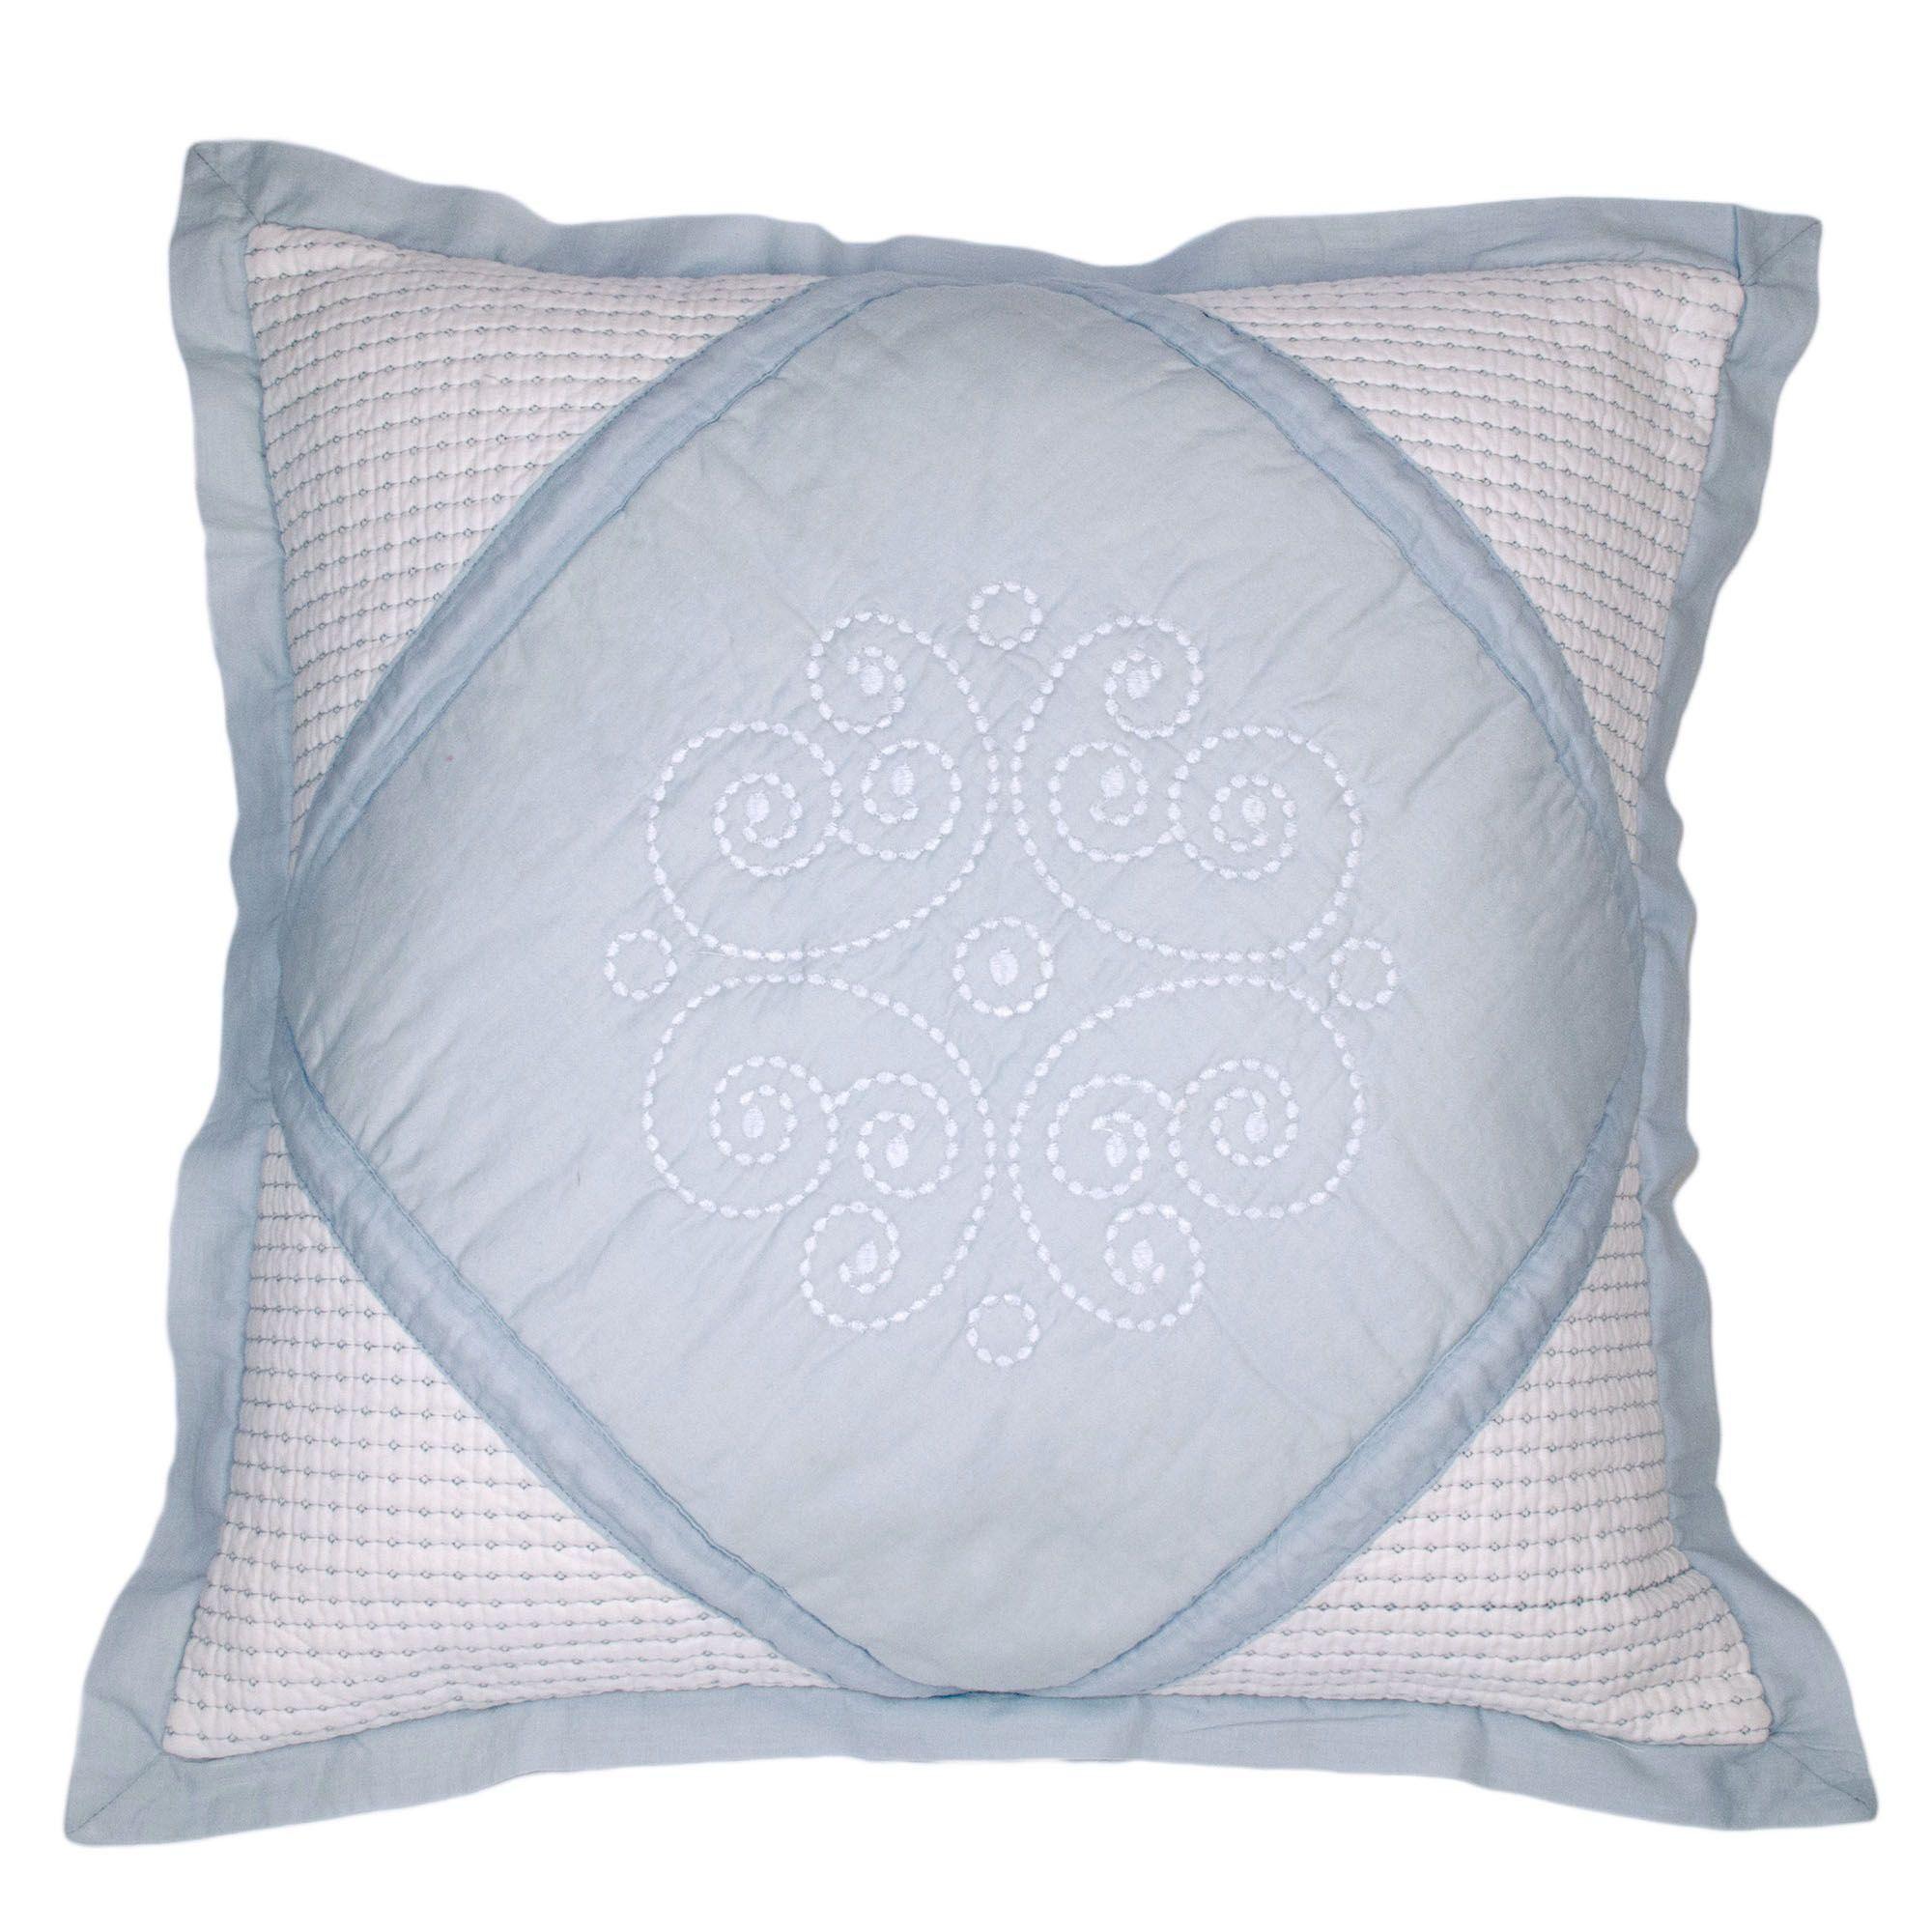 French Perle Decorative Pillows - a Lenox design